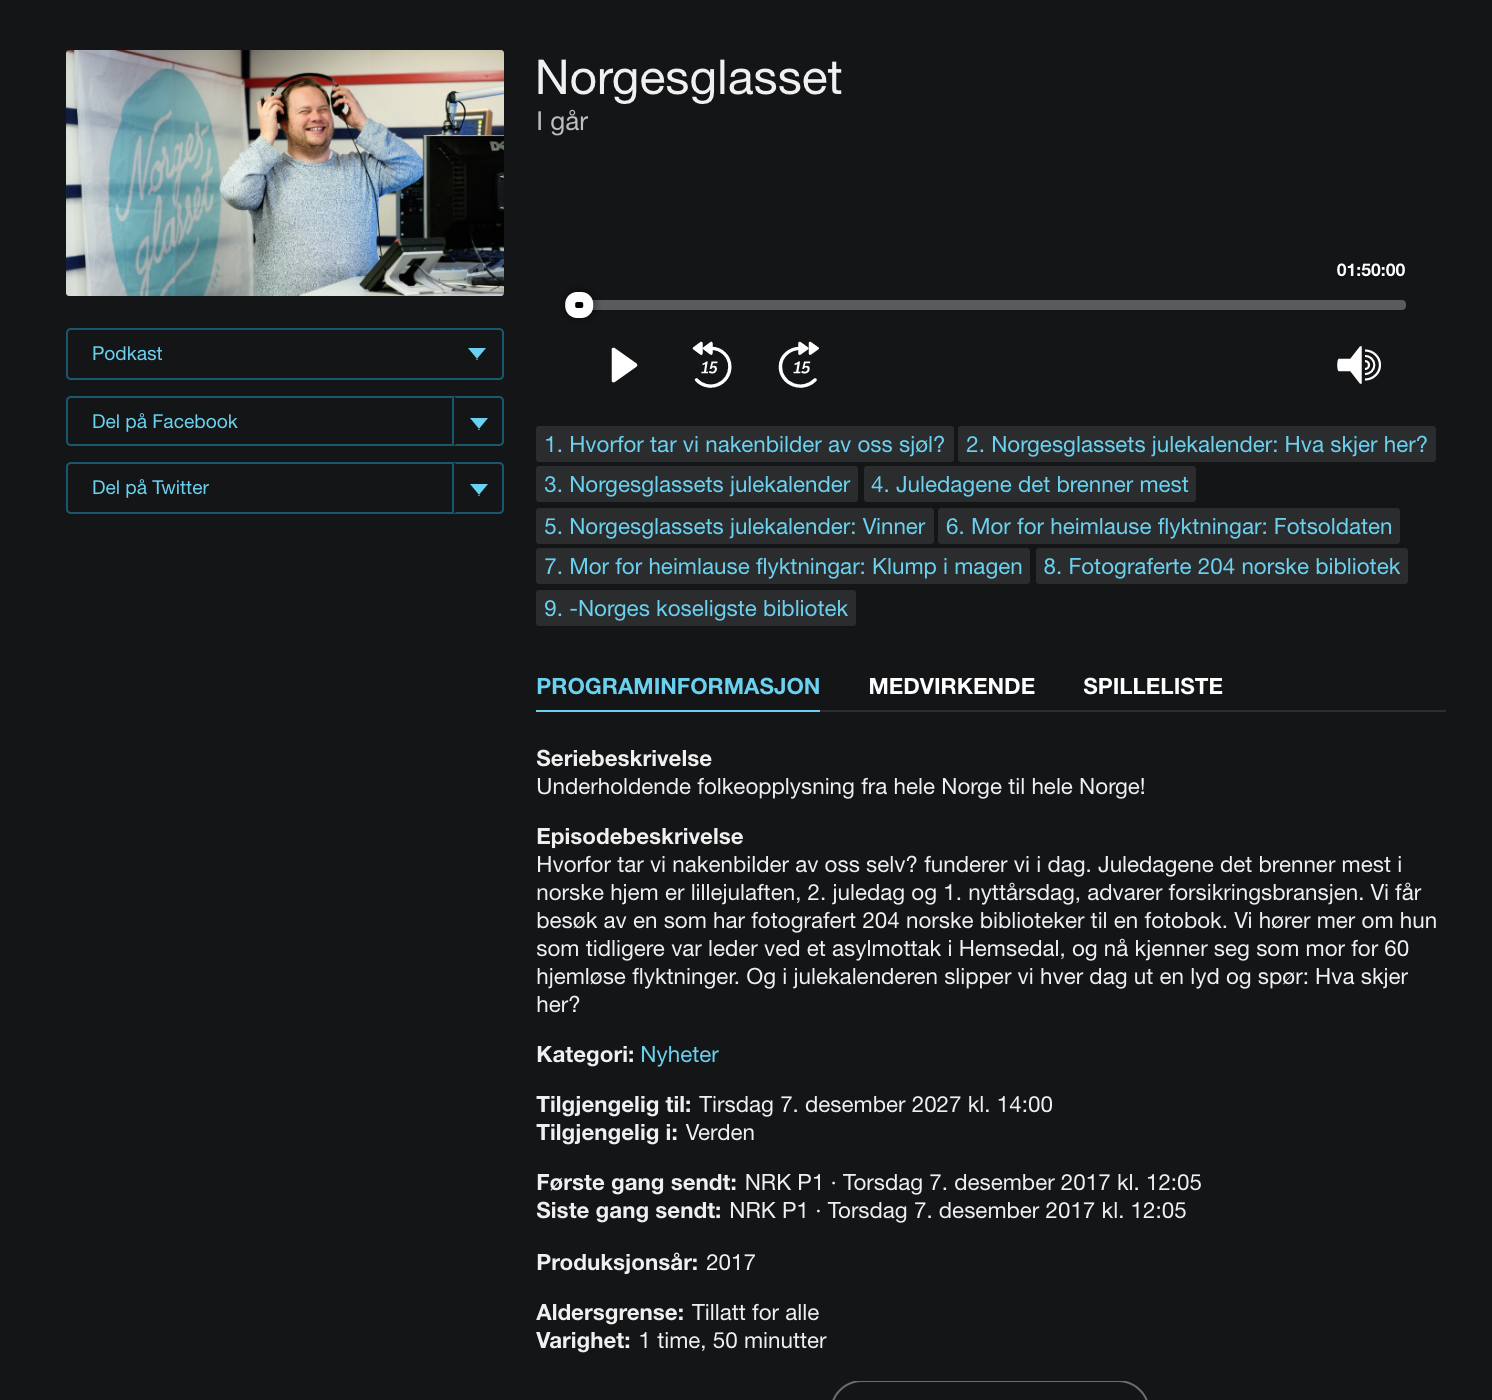 2017-12-07 P1 Norgesglasset.png